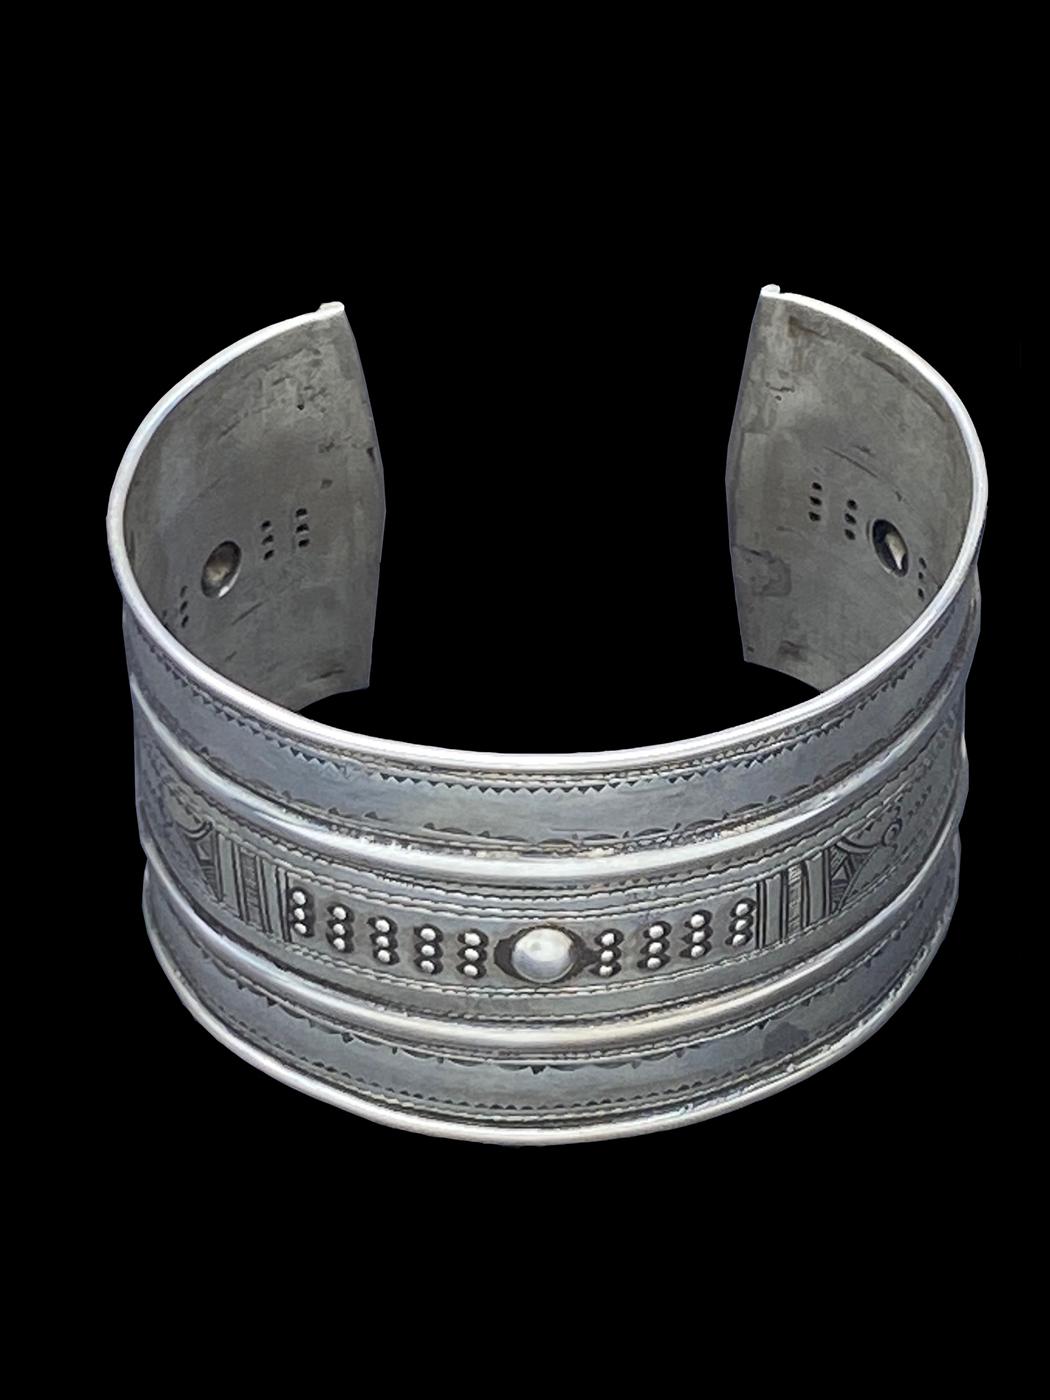 Tuareg Sterling Silver Cuff Bracelet